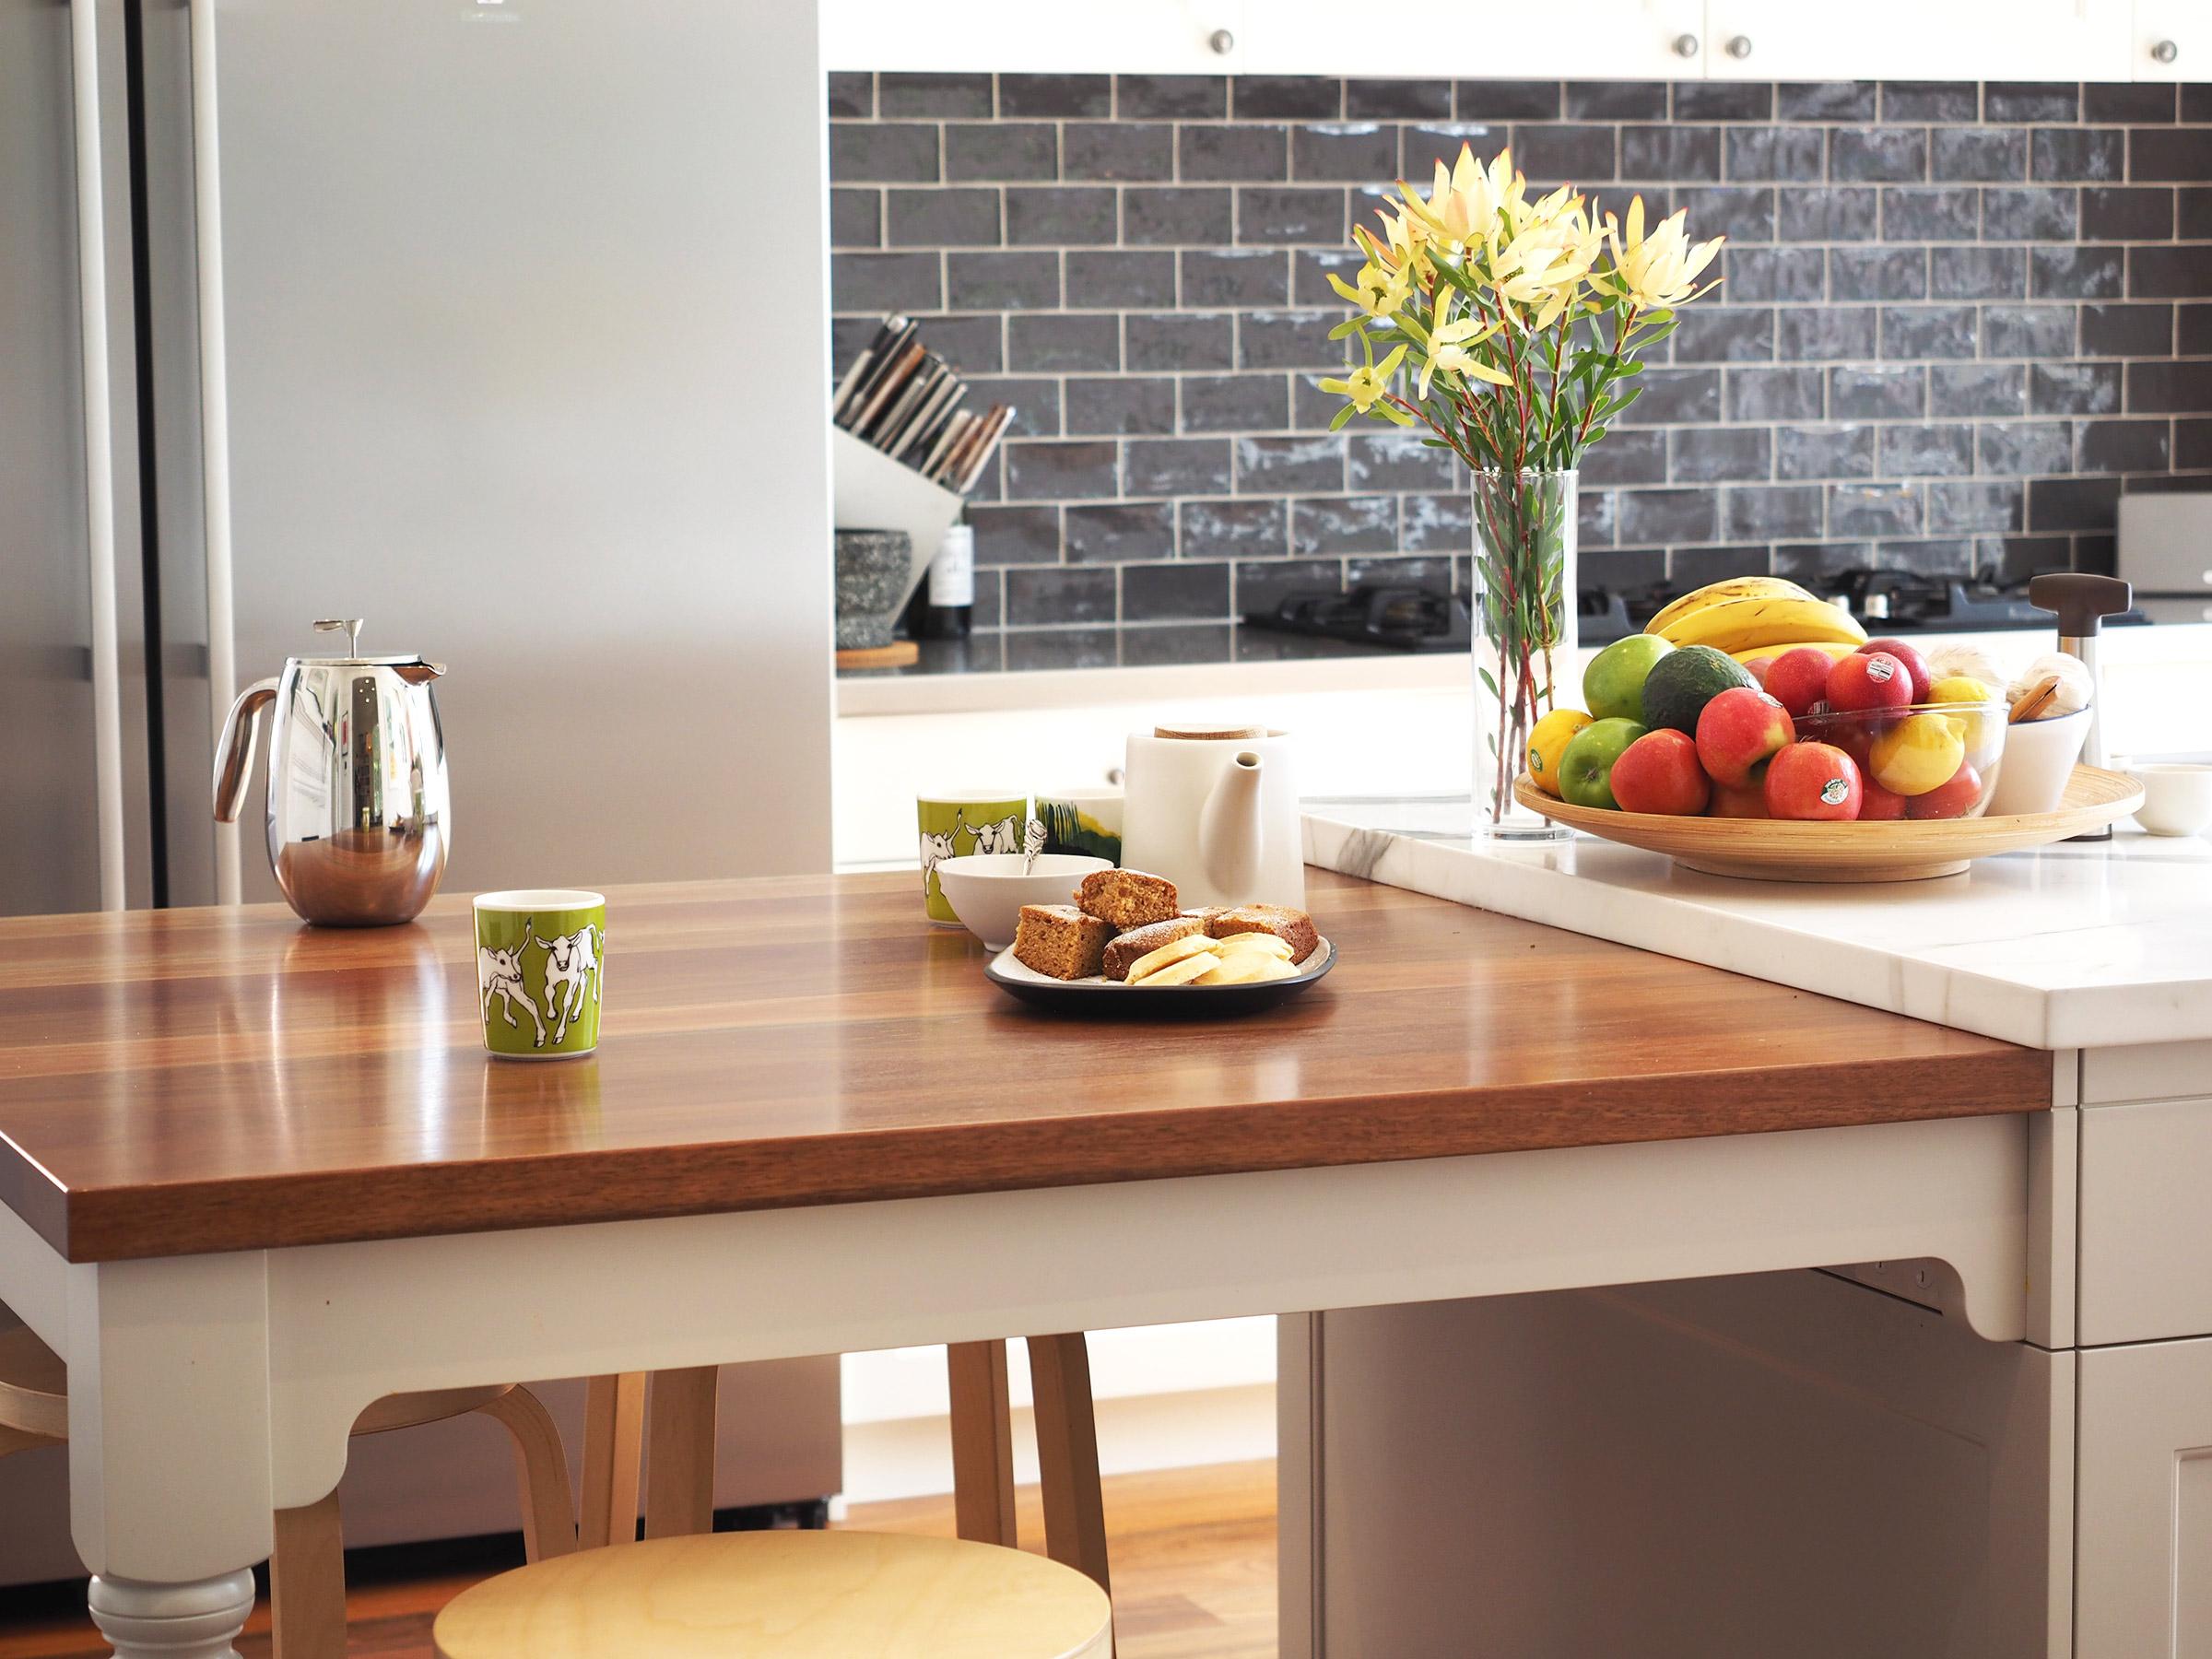 kitchen-design-edwardian-villa-blue-fruit-interior-design-melbourne.jpg